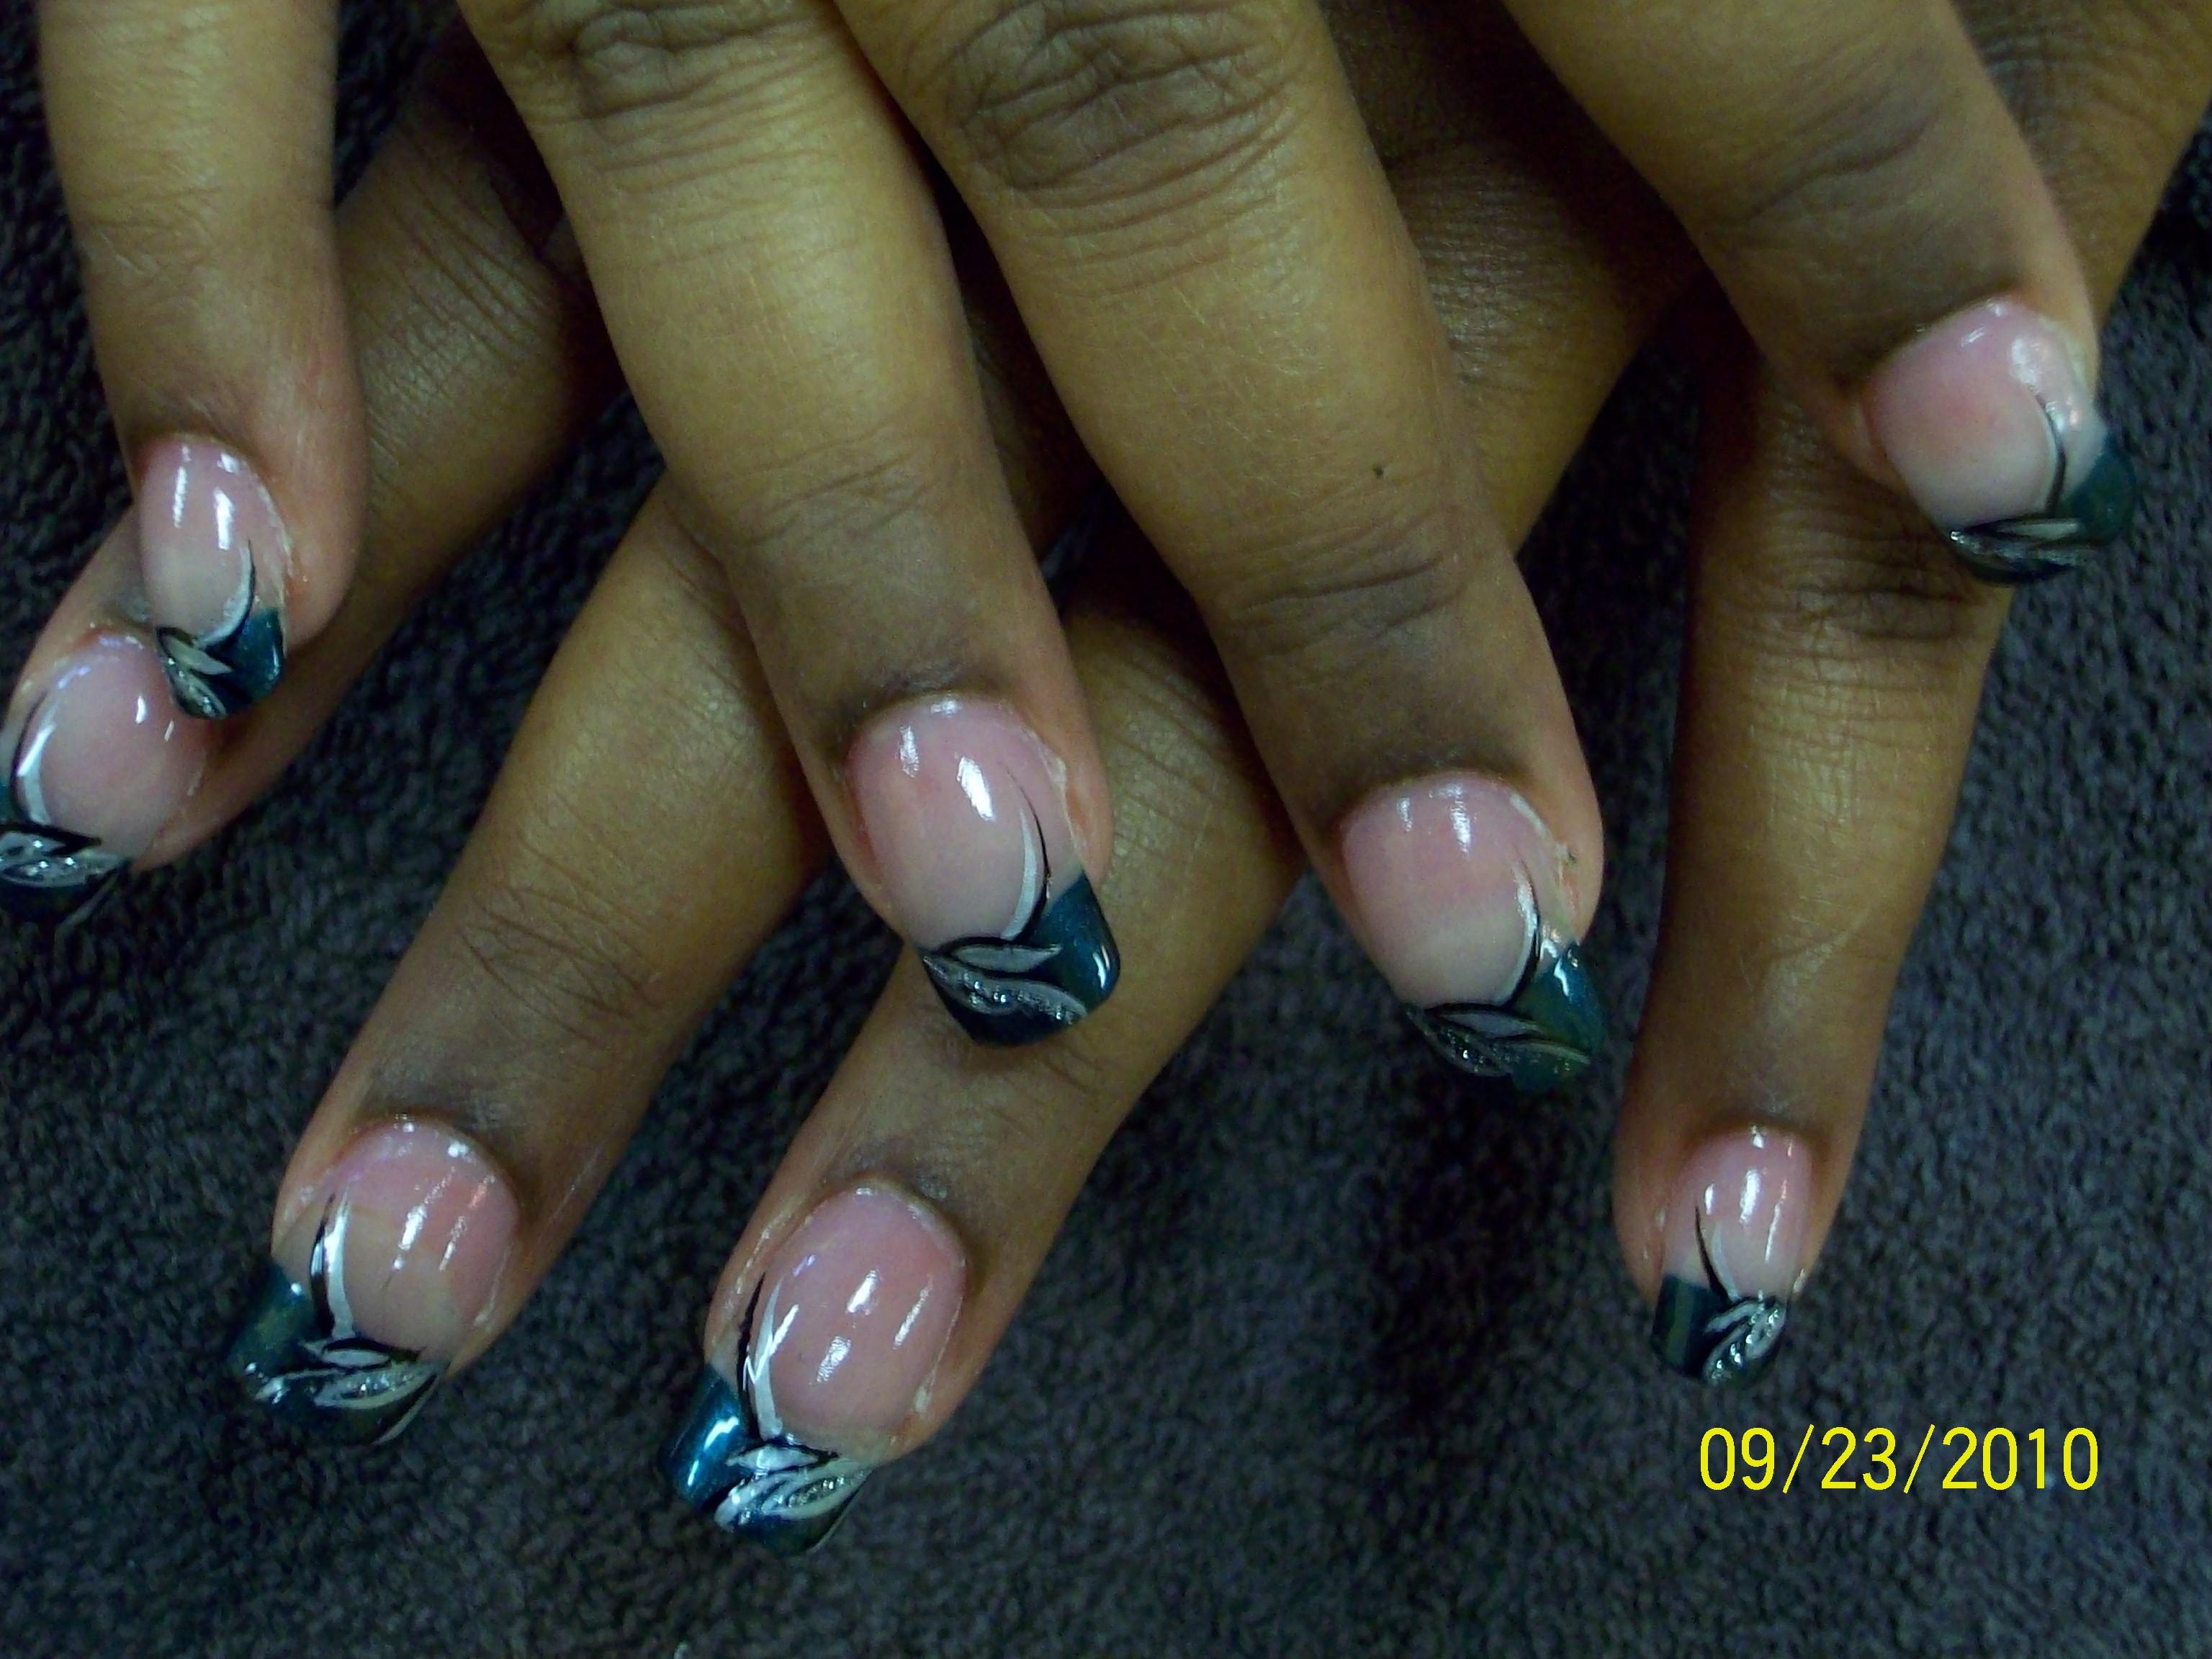 Sunset Nails Spa 2603 Sw 21st St Topeka Ks 66604 Yp